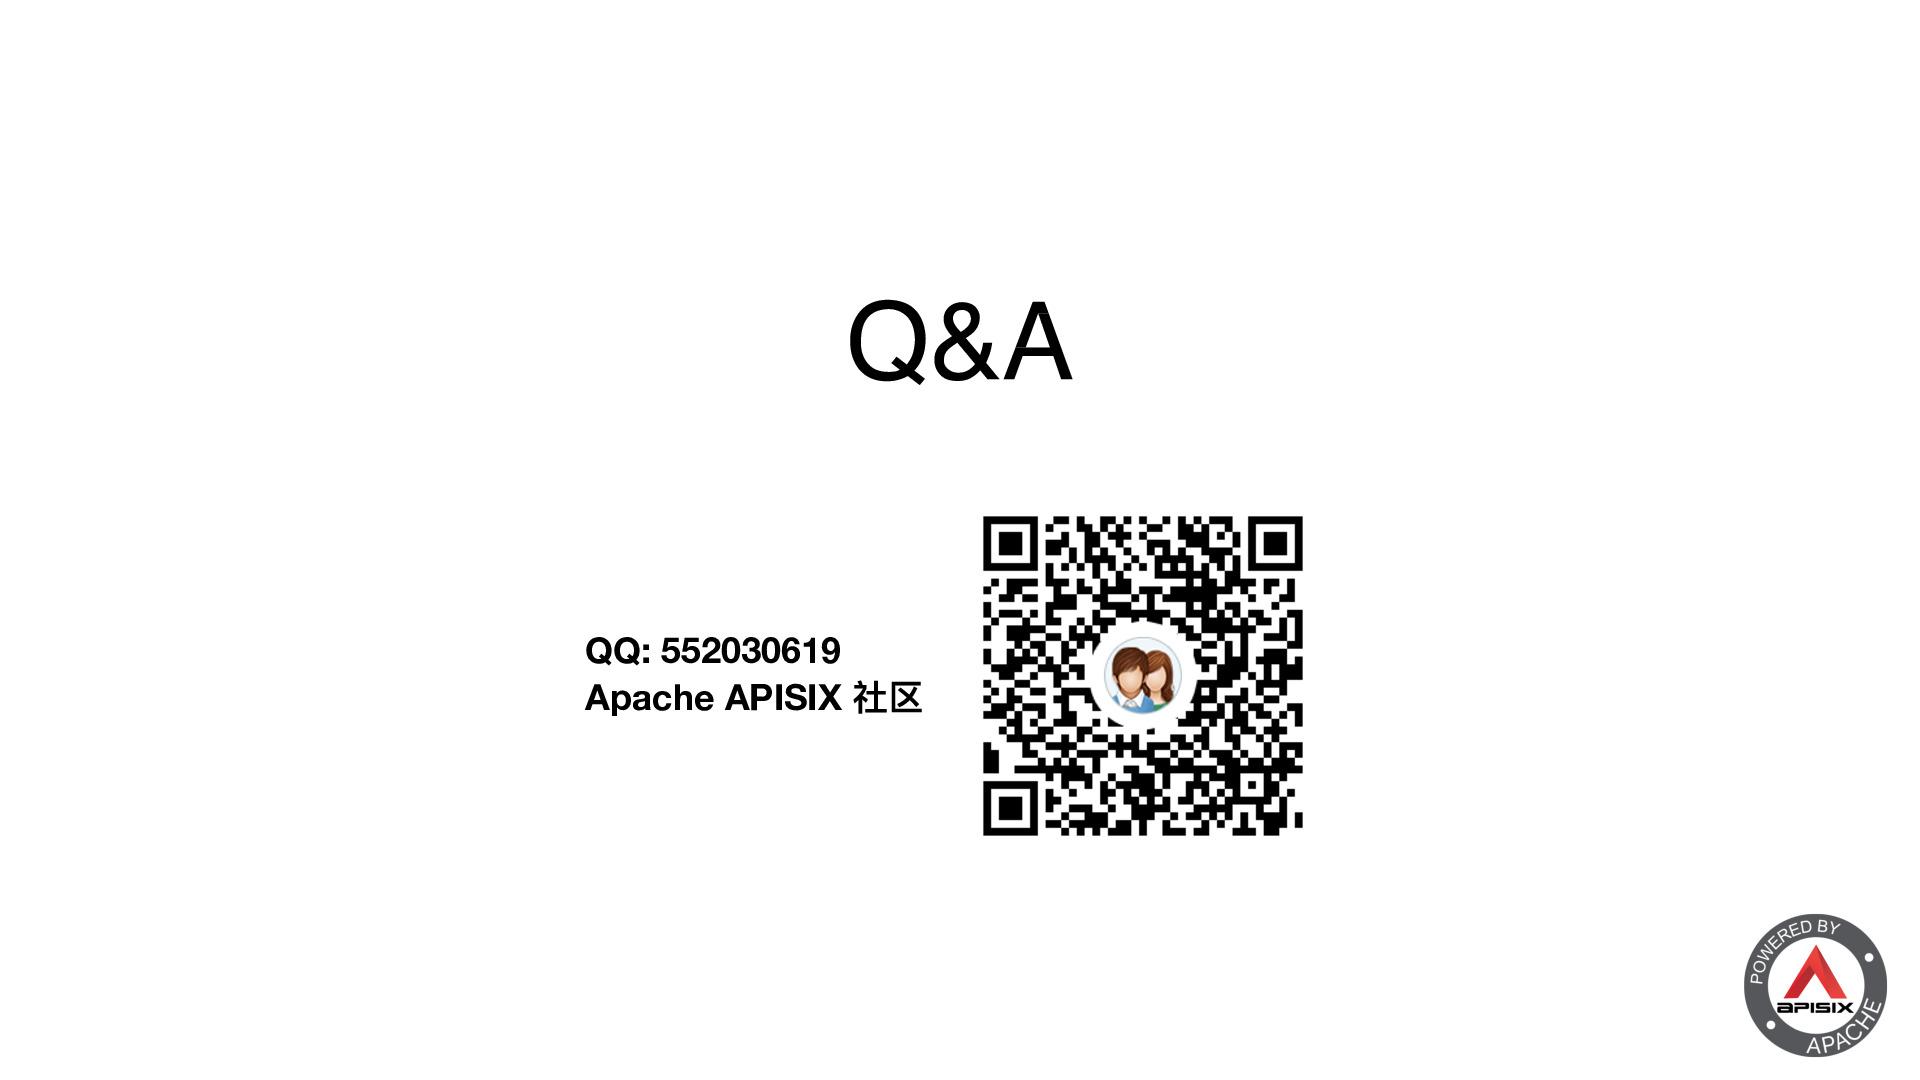 https://opentalk-blog.b0.upaiyun.com/prod/2020-08-13/7d0ca1e6174f1aaec1a48800a8e05ec2